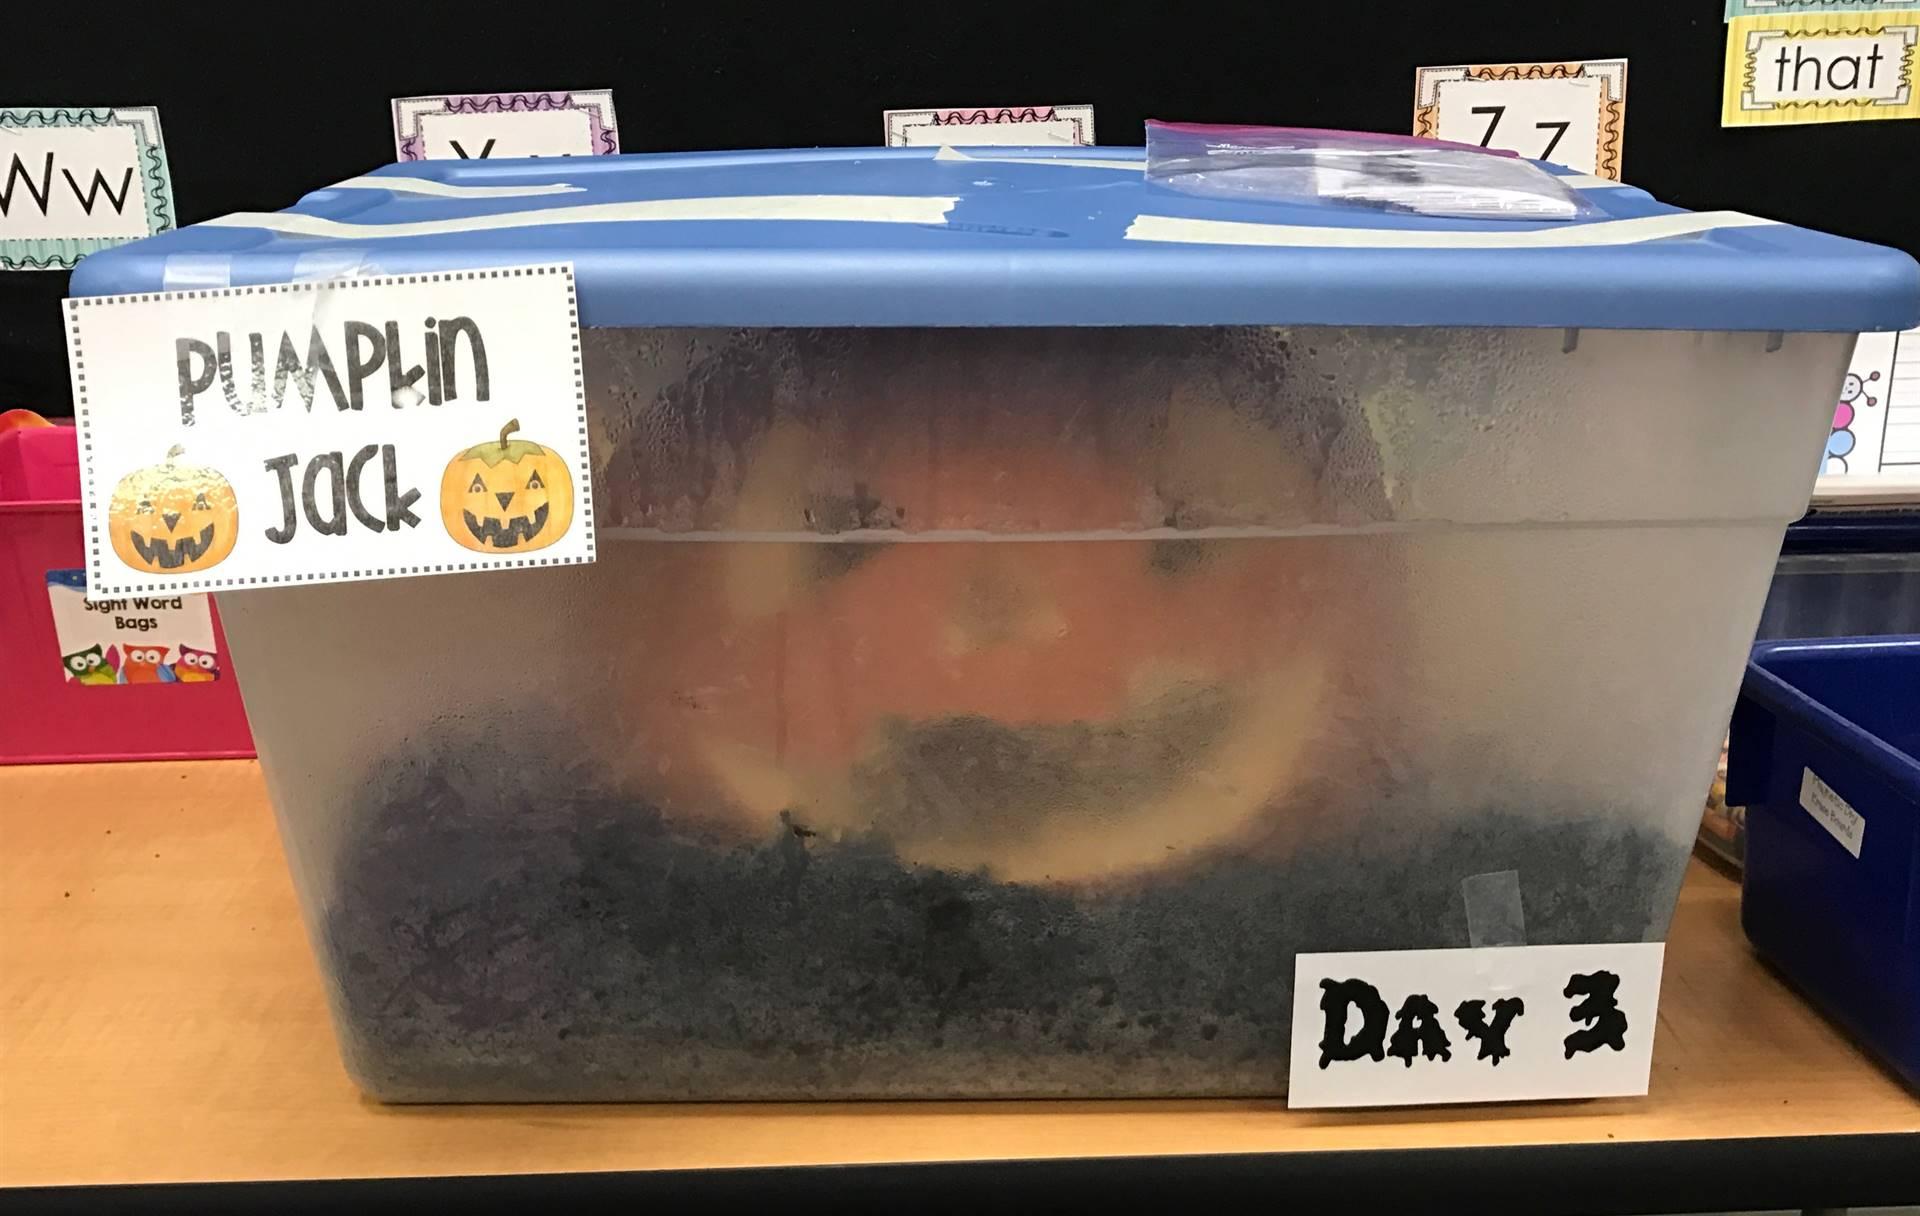 Day 3 of Pumpkin Jack